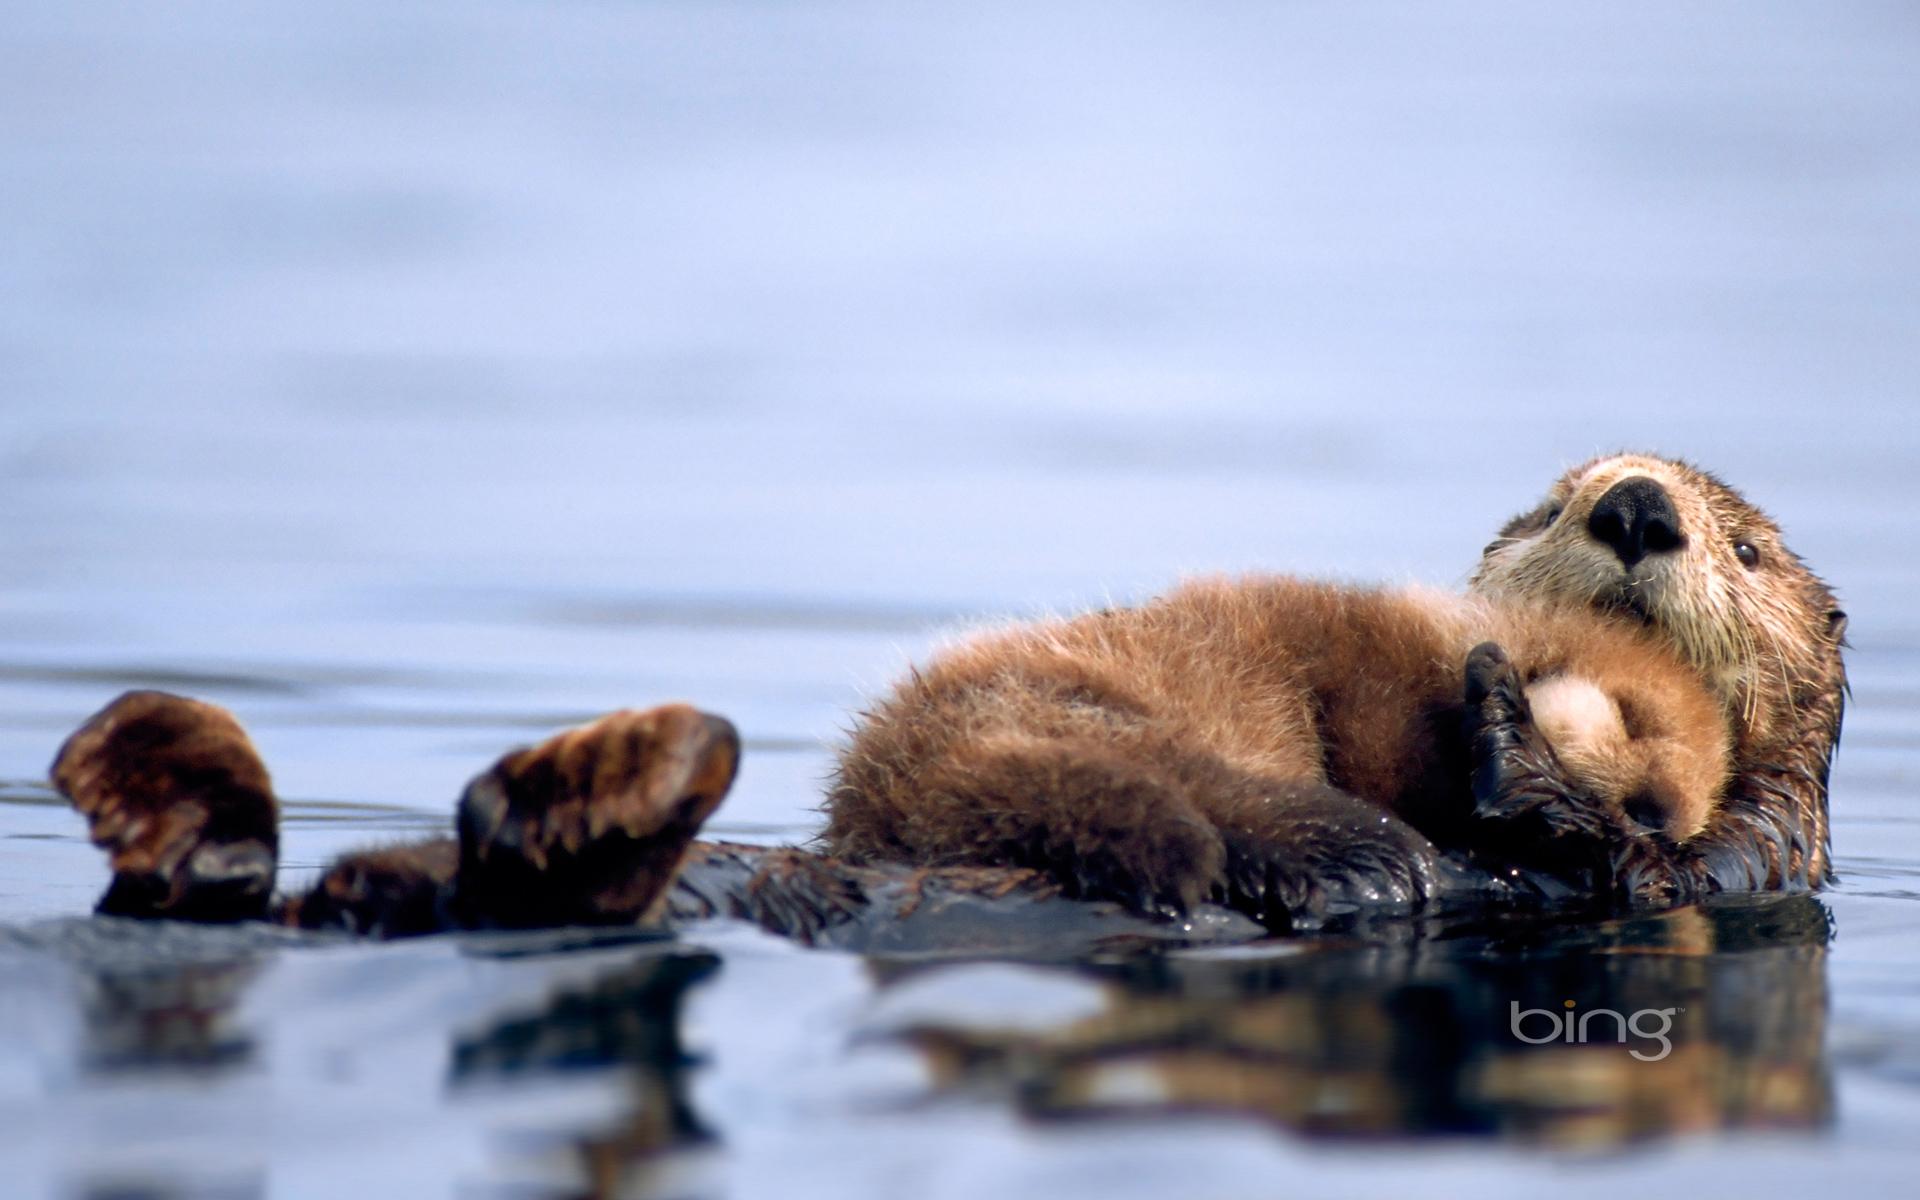 48 Otter Wallpaper By Bing On Wallpapersafari